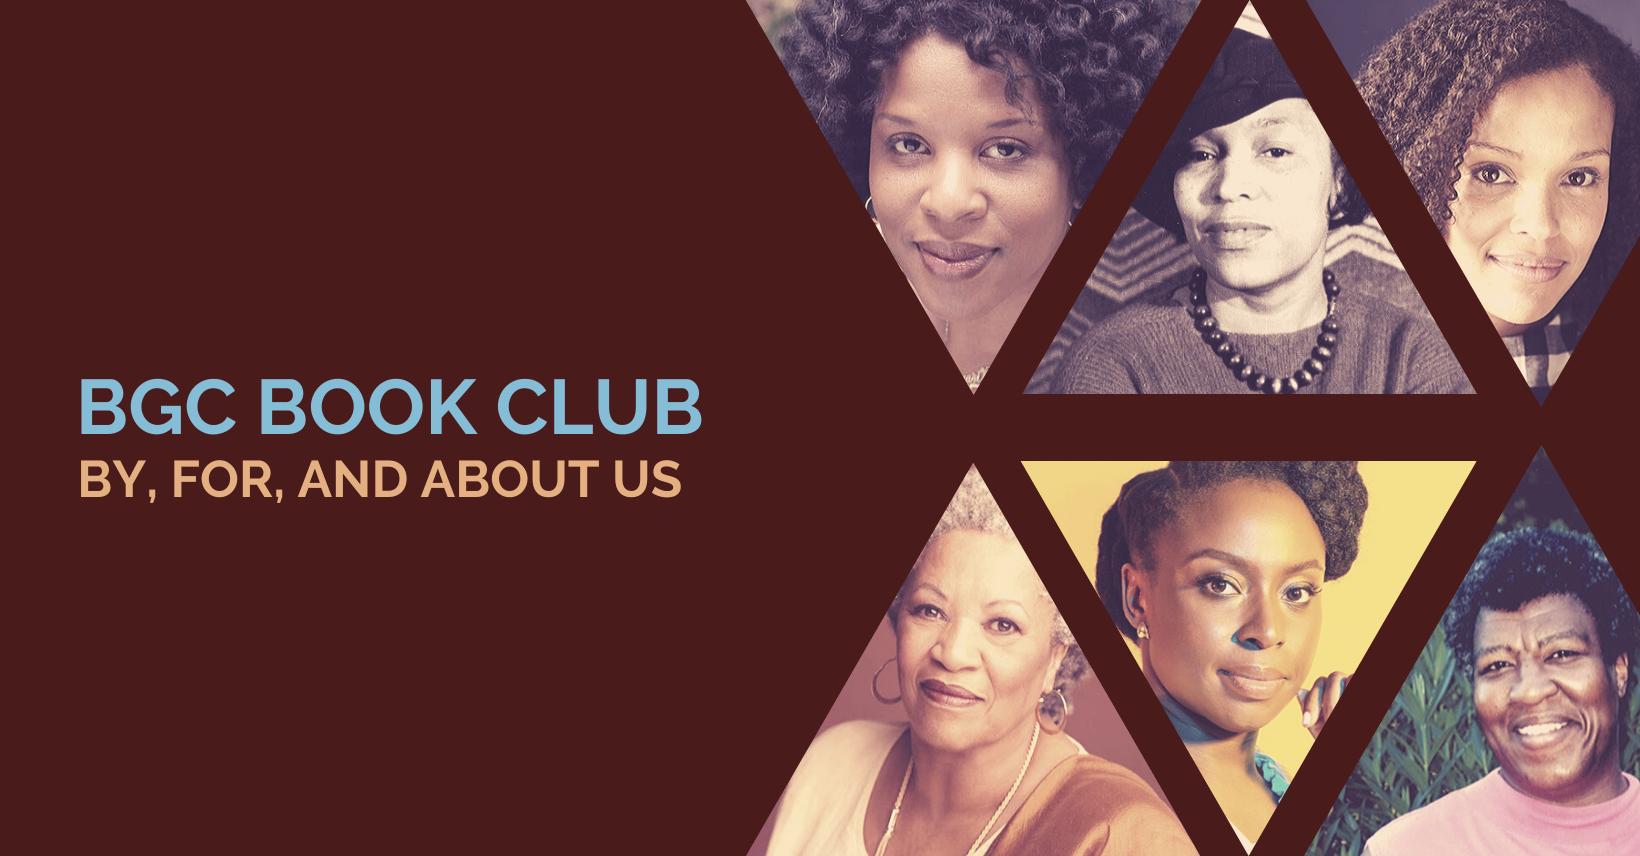 Introducing the BGC Book Club